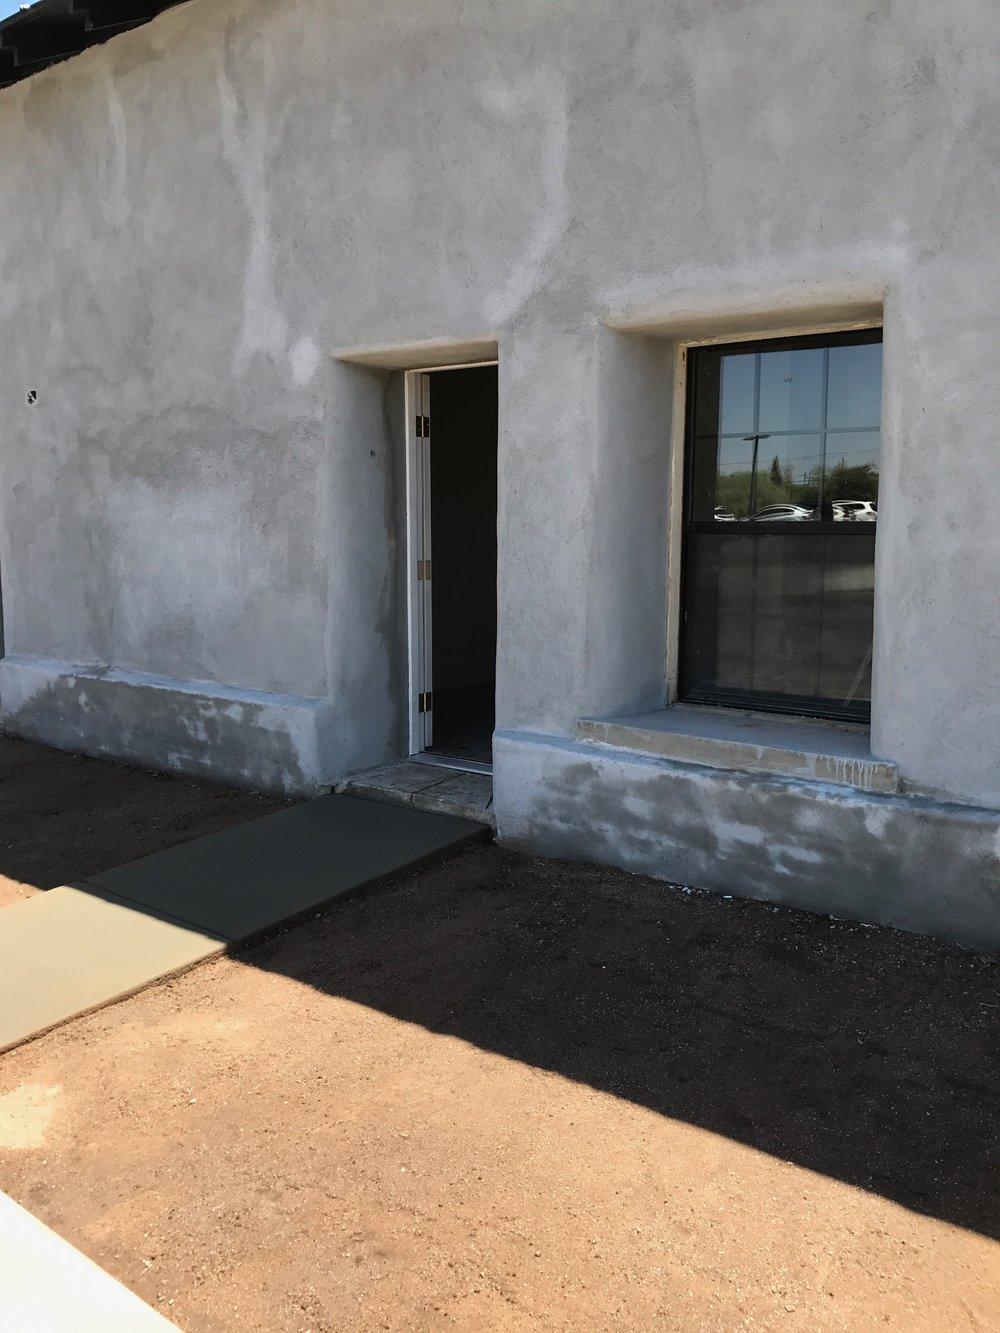 Rowhouse25 - Tremaine Ranch - Air BNB Rental - Phoenix, Arizona22.JPG